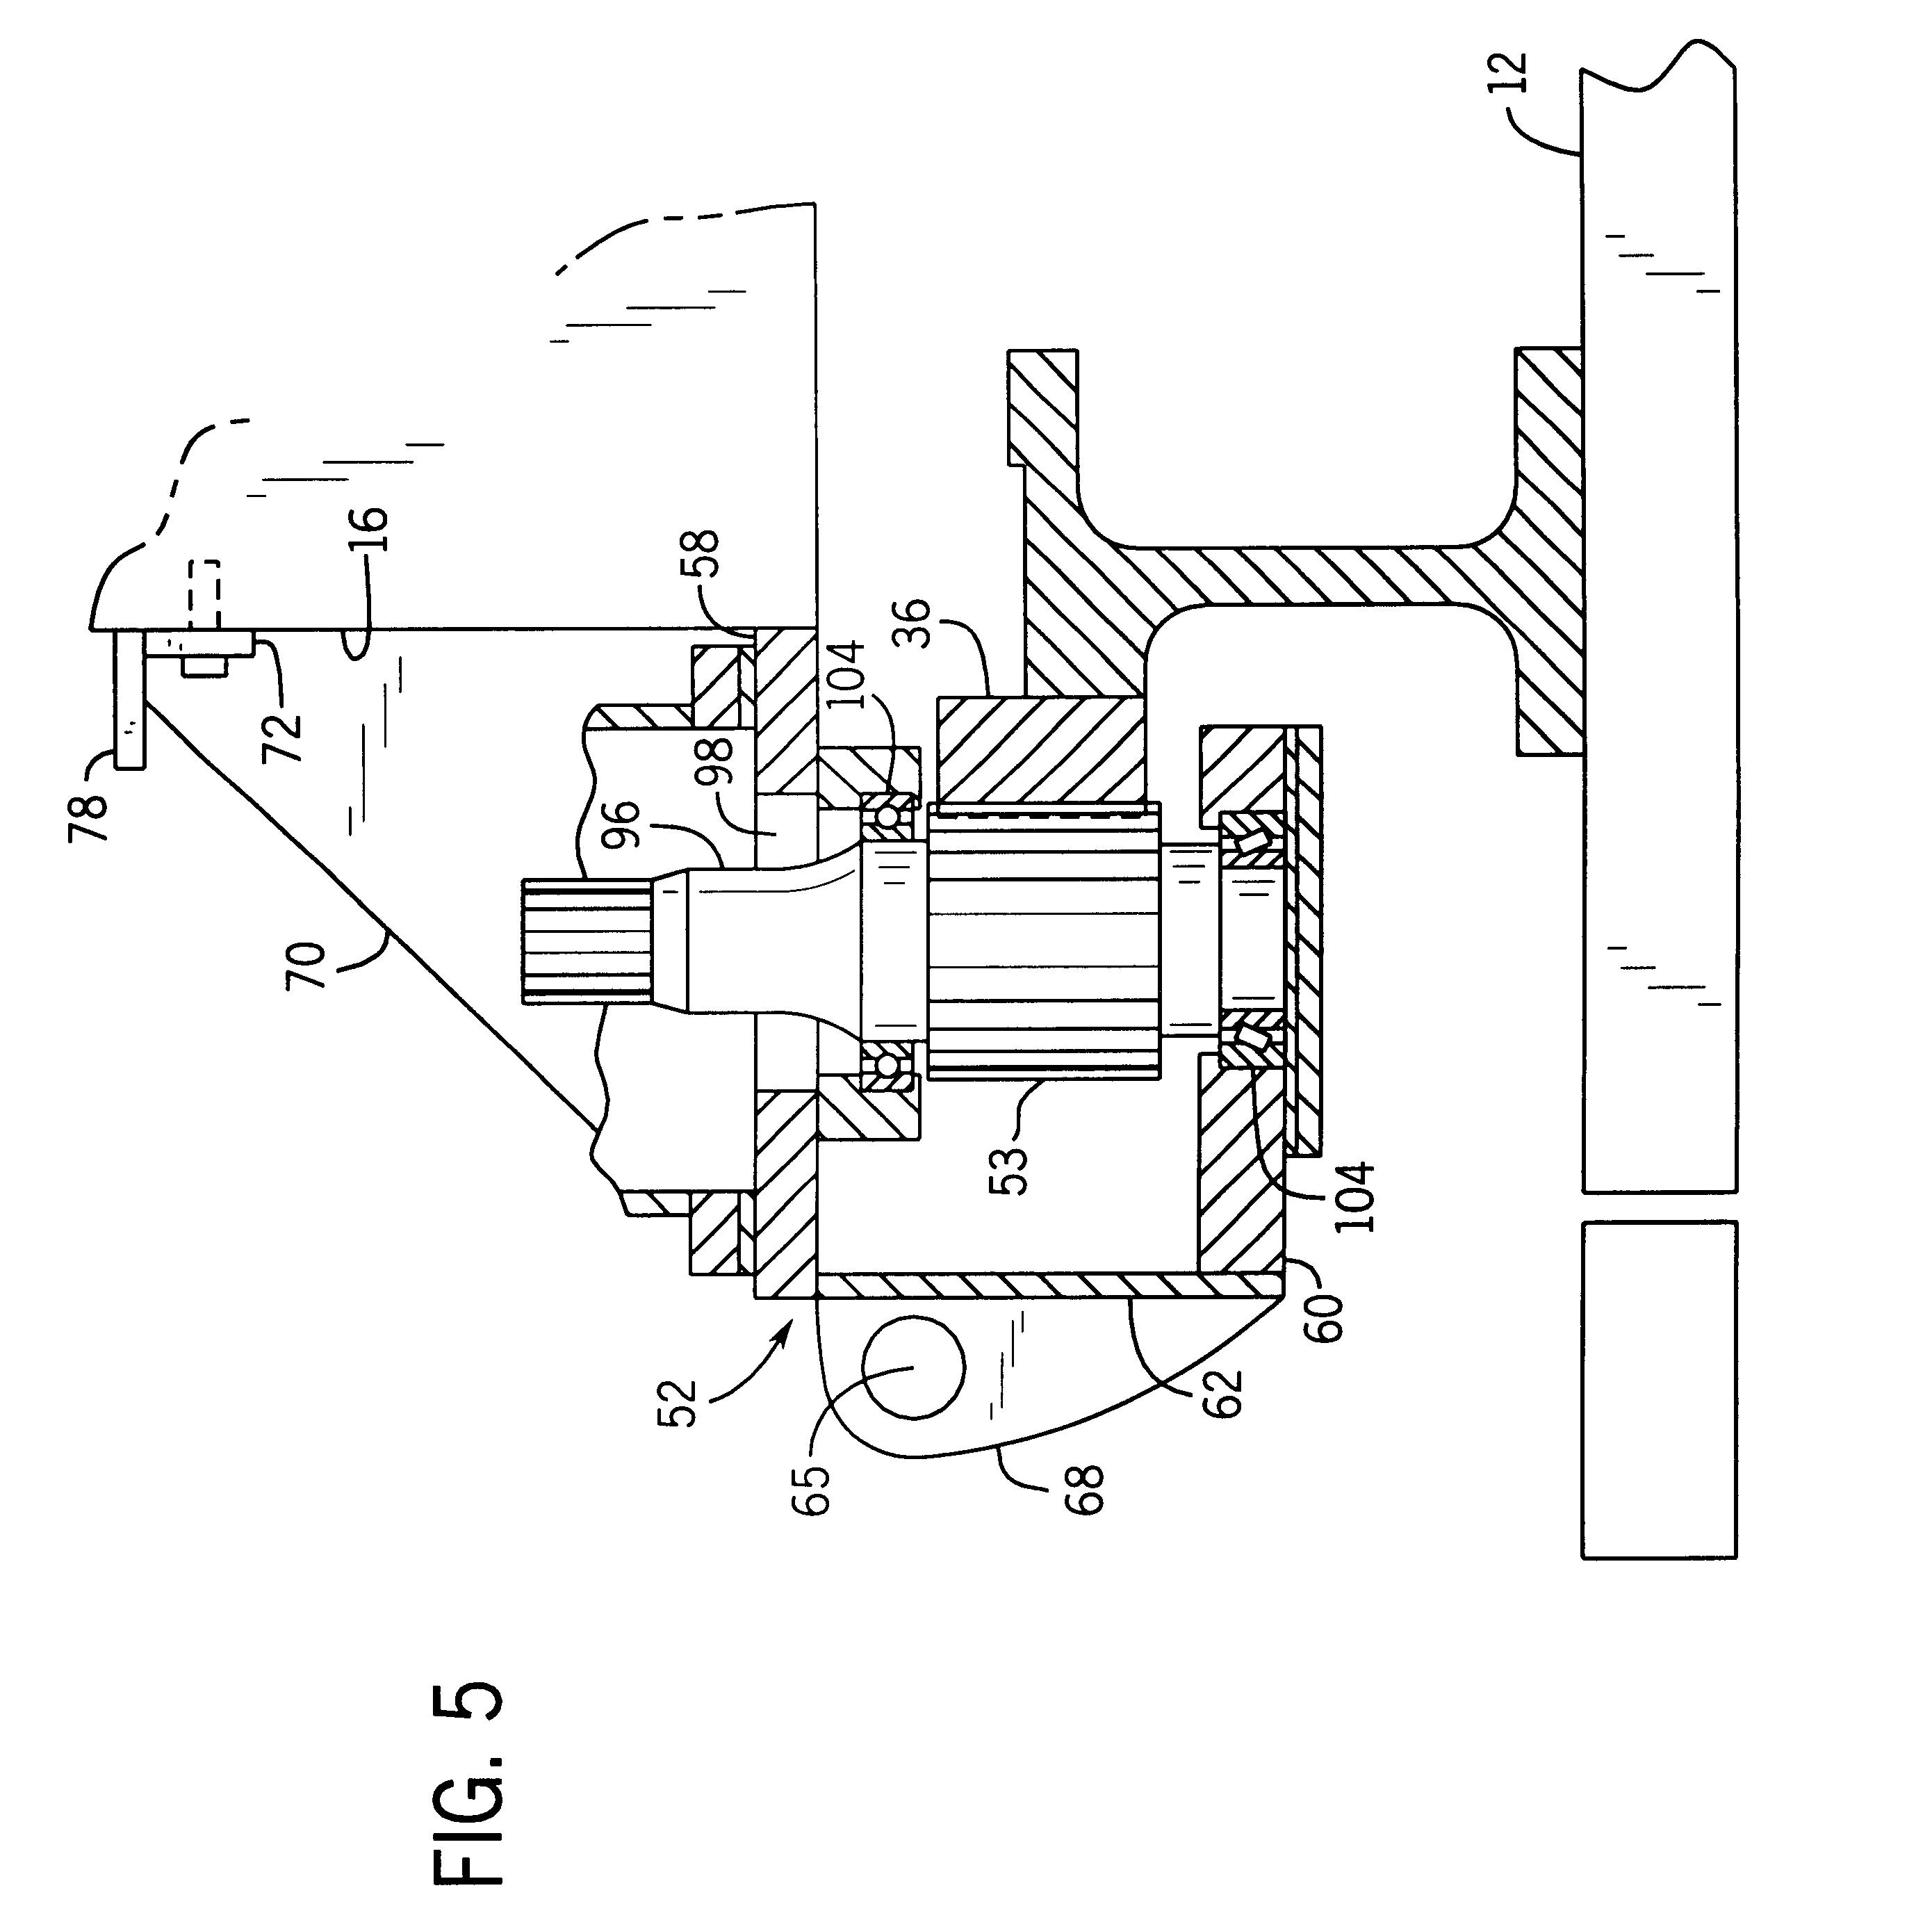 Diagram Engine Wiring Diagram 1996 Nissan 240sx Full Version Hd Quality Nissan 240sx Sitexnino Filmarco It